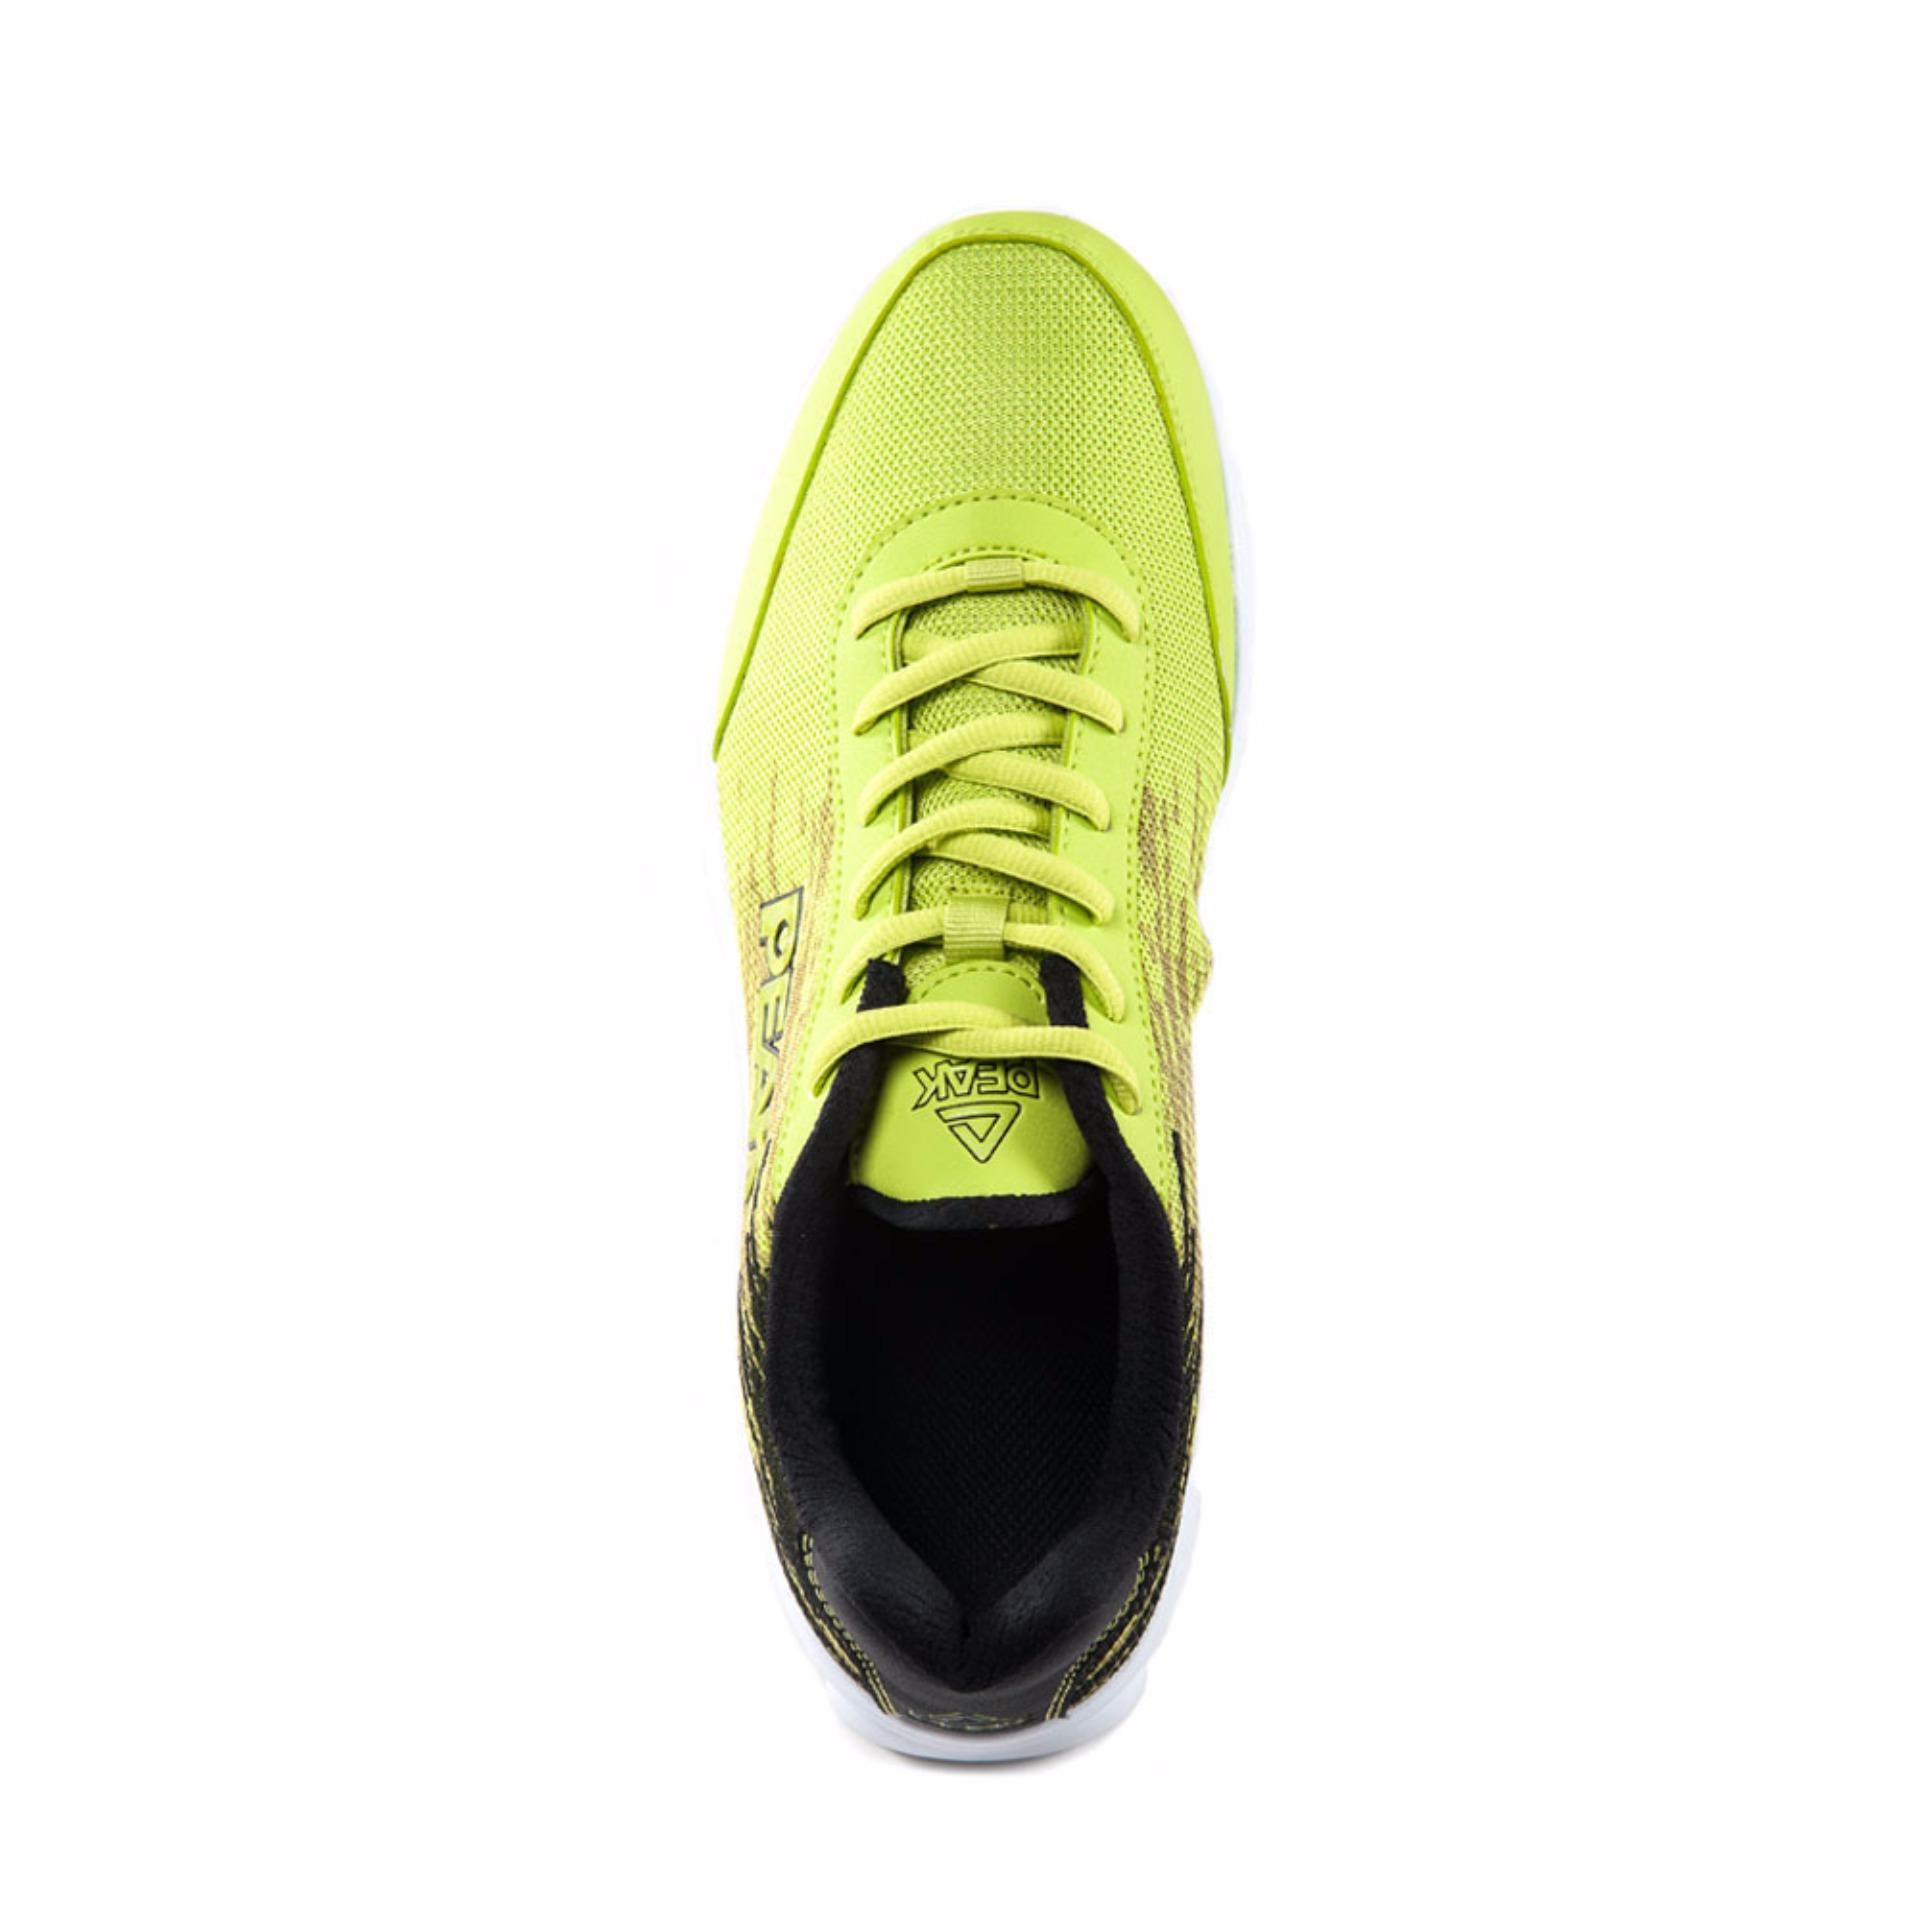 Peak E313021a Crossover I Edition Men Outdoor Basketballshoes Black Sepatu Basket Nba Challenger Shoes E51041a Red Orange Running E51057h Yellow